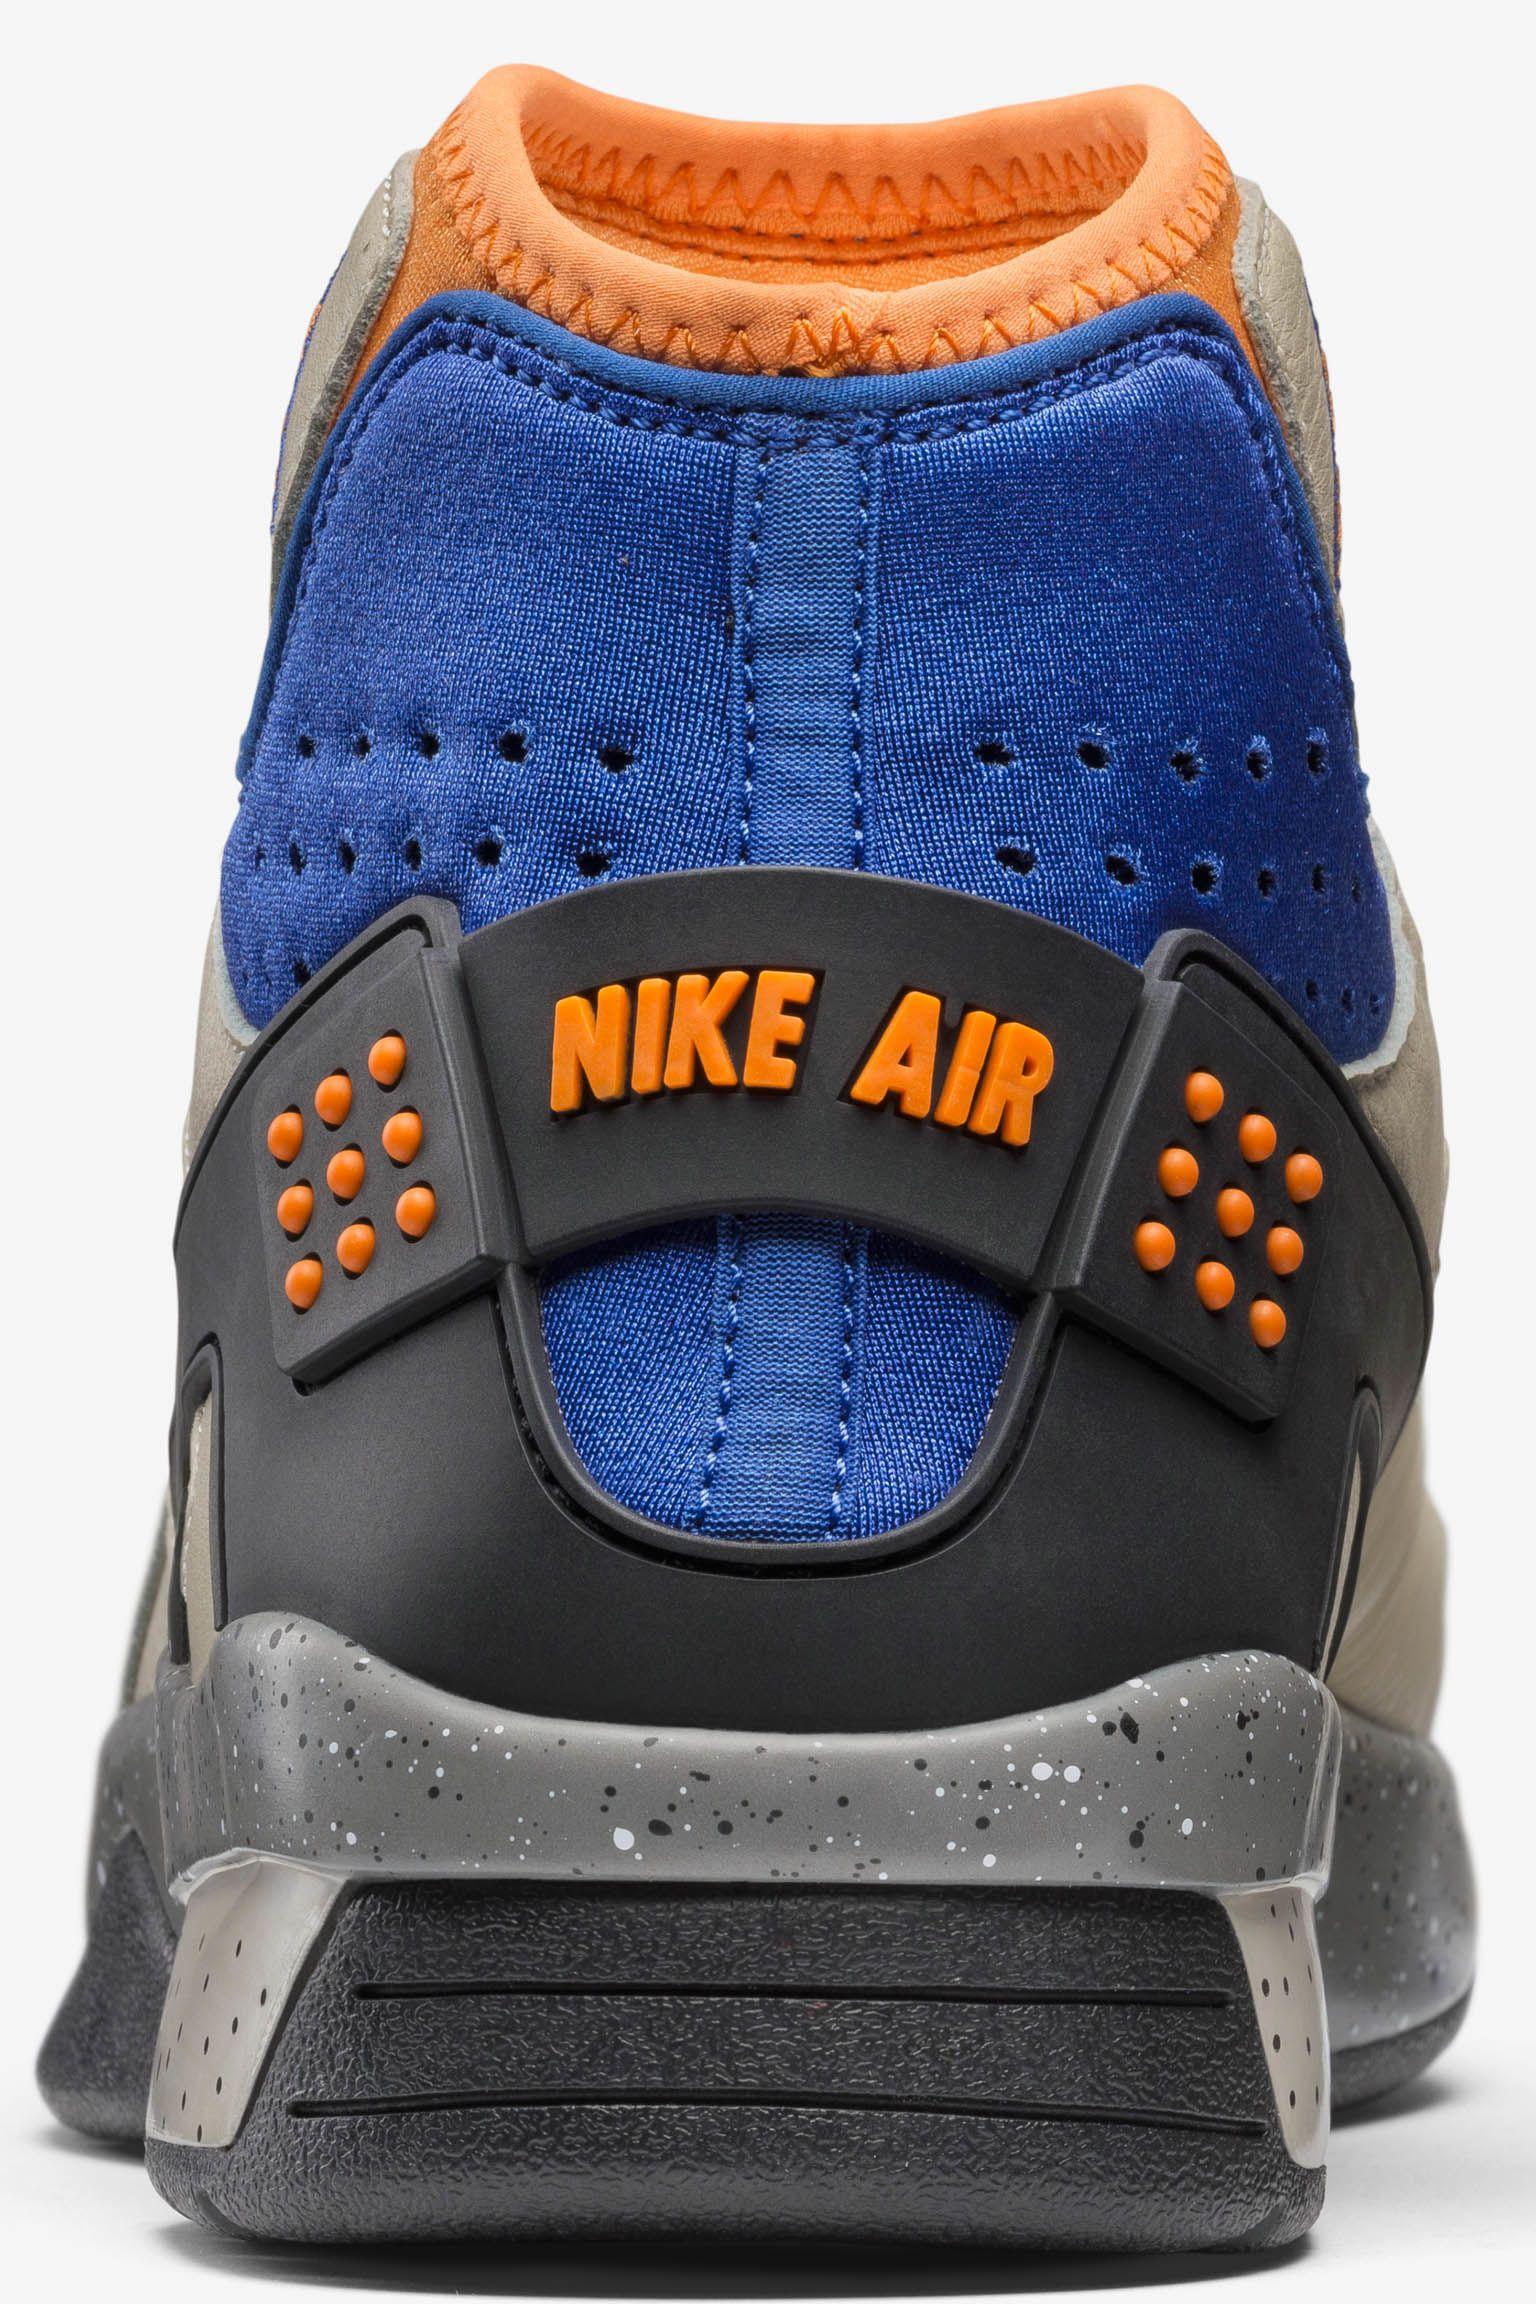 Nike Air Mowabb 'Rattan & Birch-Bright Mandarin'